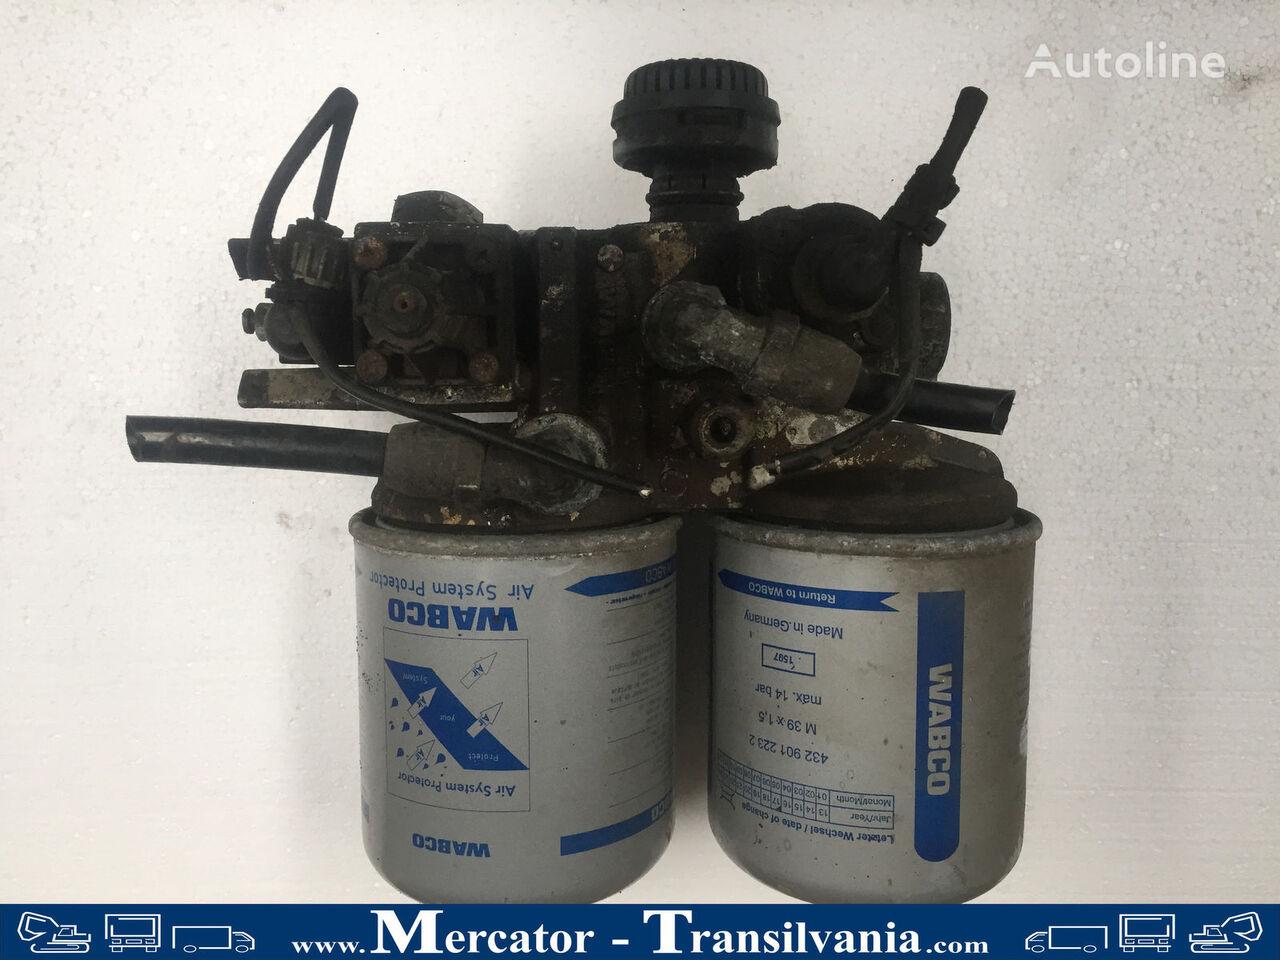 Luftauslassventil pneumatic valve for SETRA SG 321 UL bus for parts